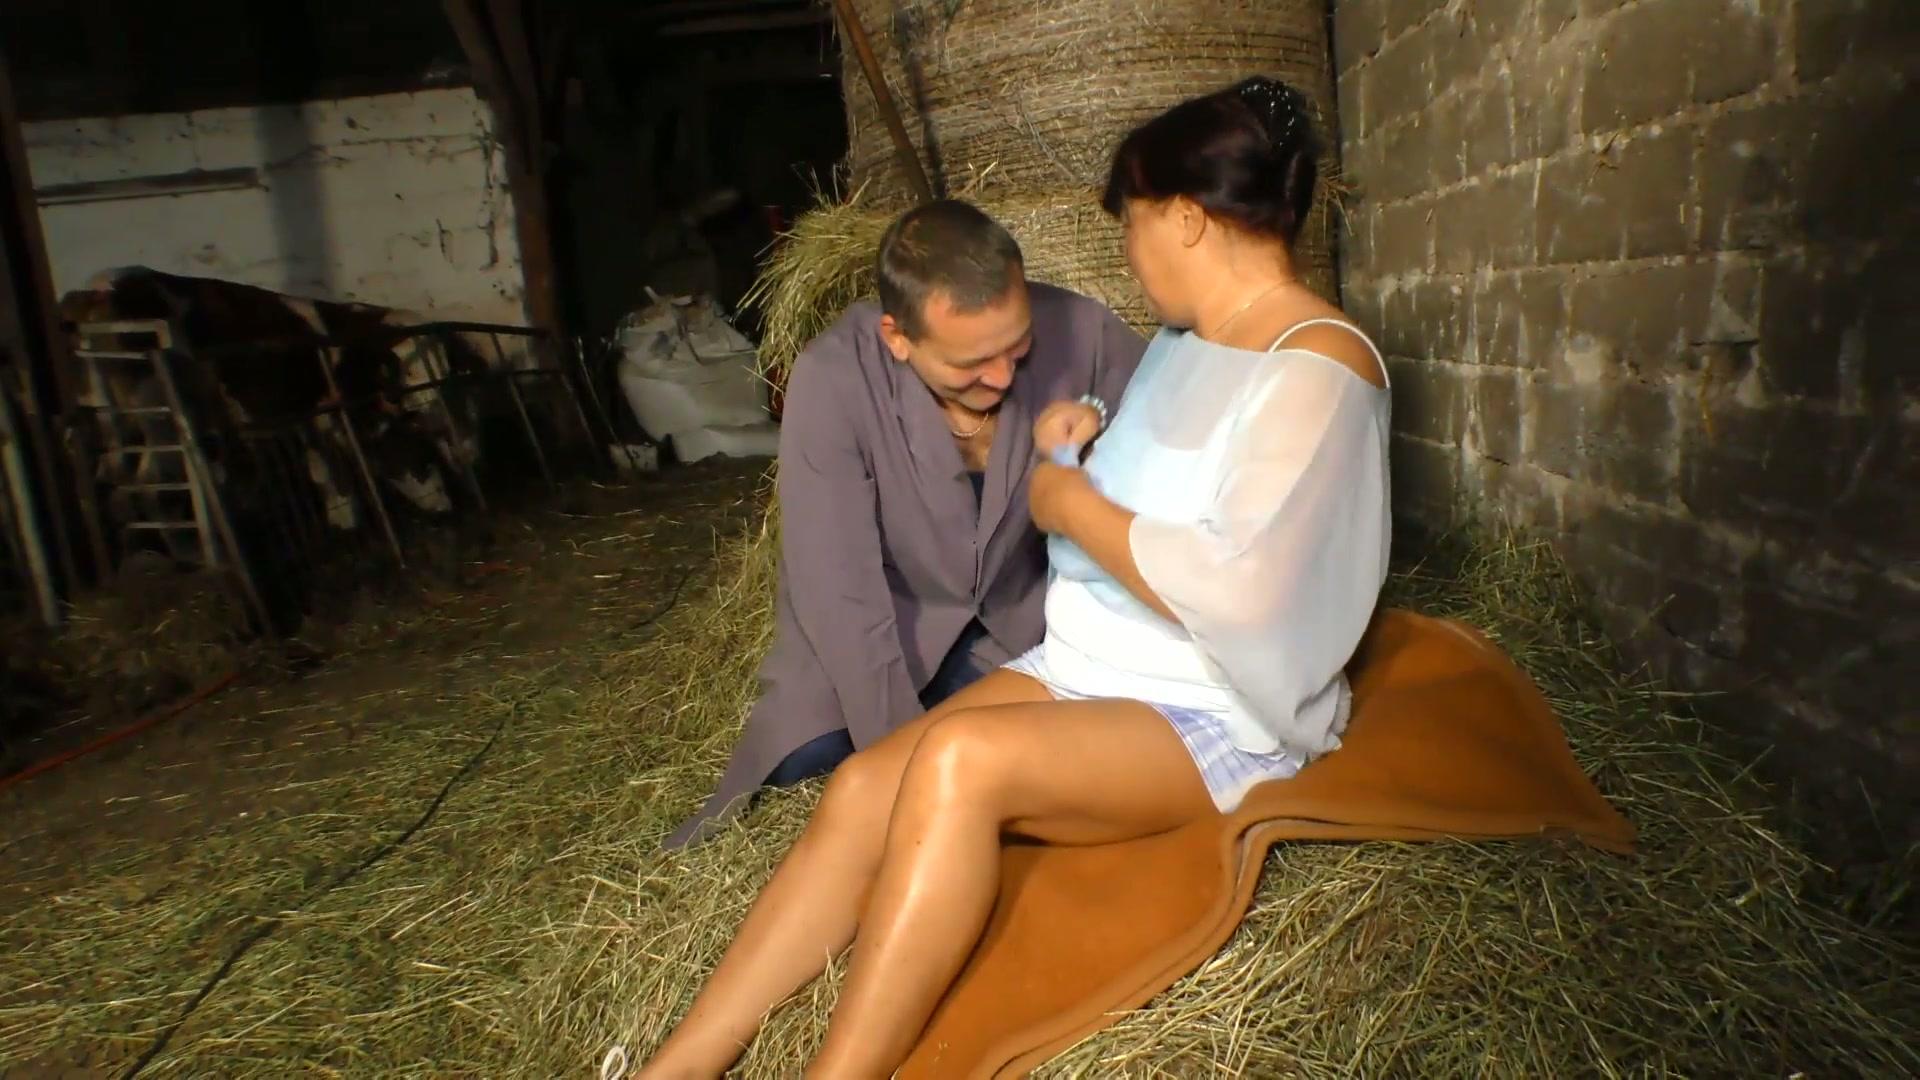 gynotest naken